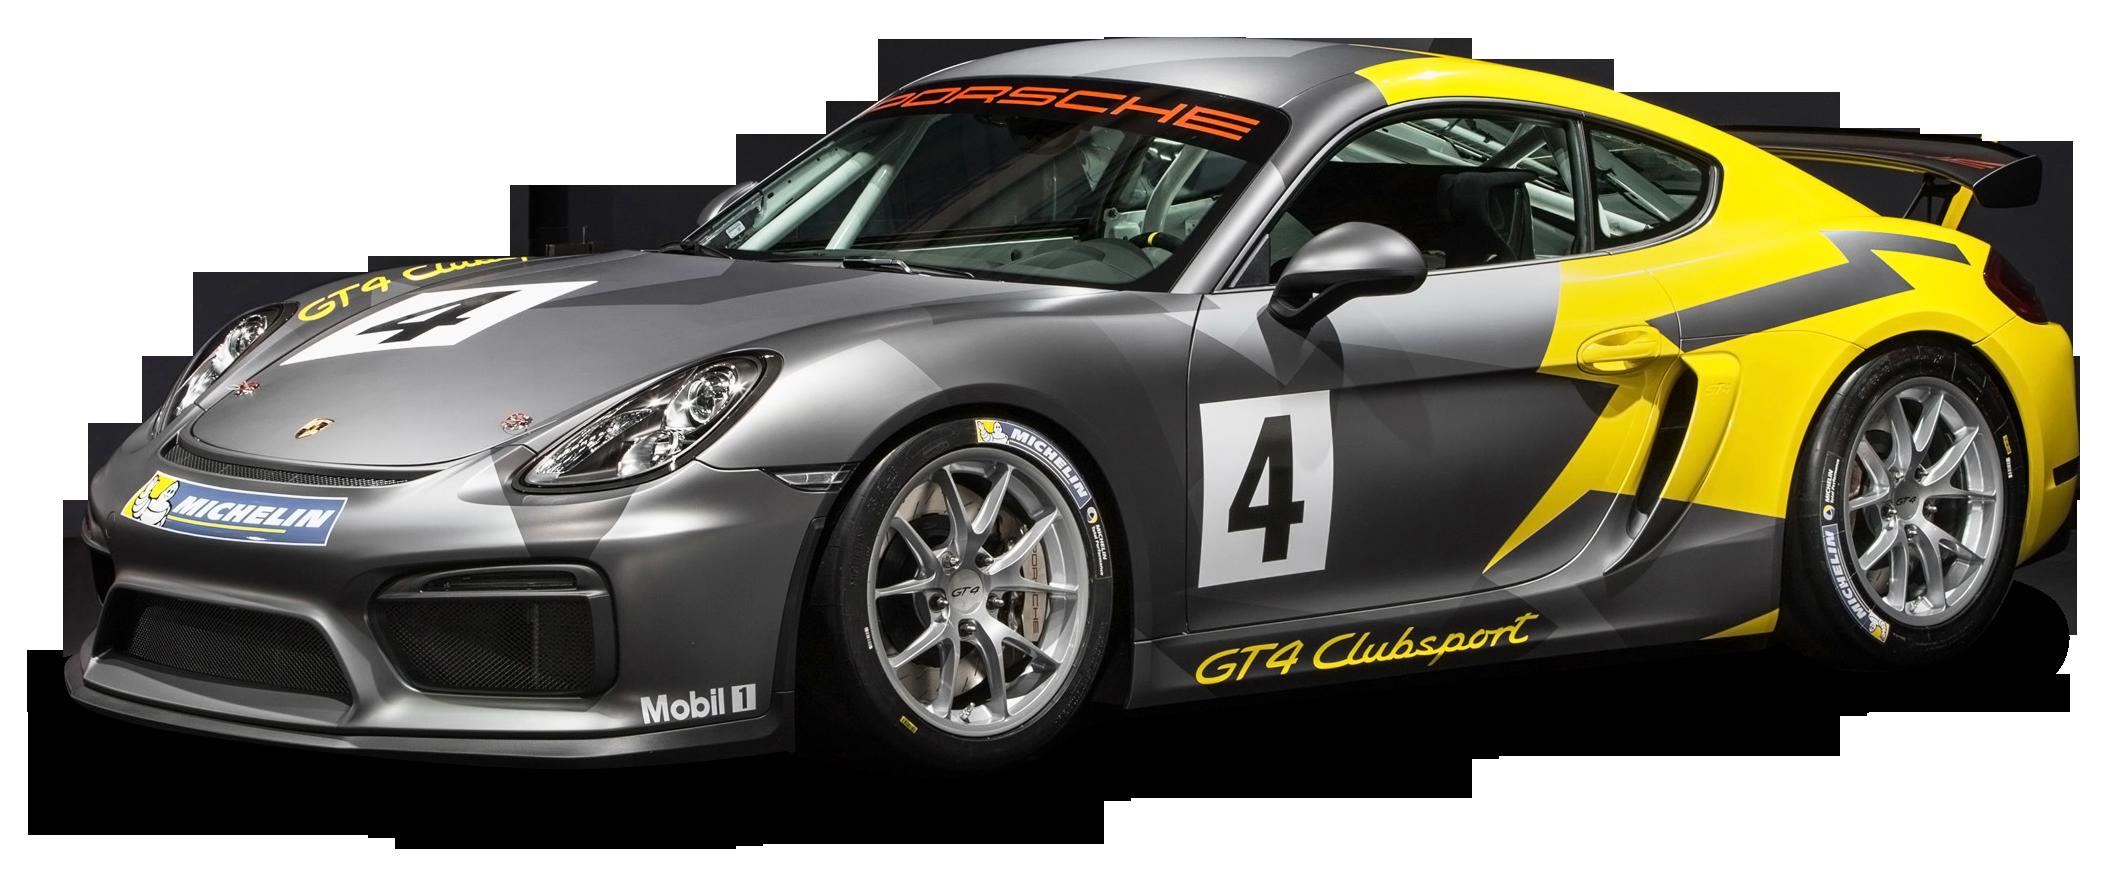 Racing Cars PNG HD Transparent Racing Cars HD.PNG Images.